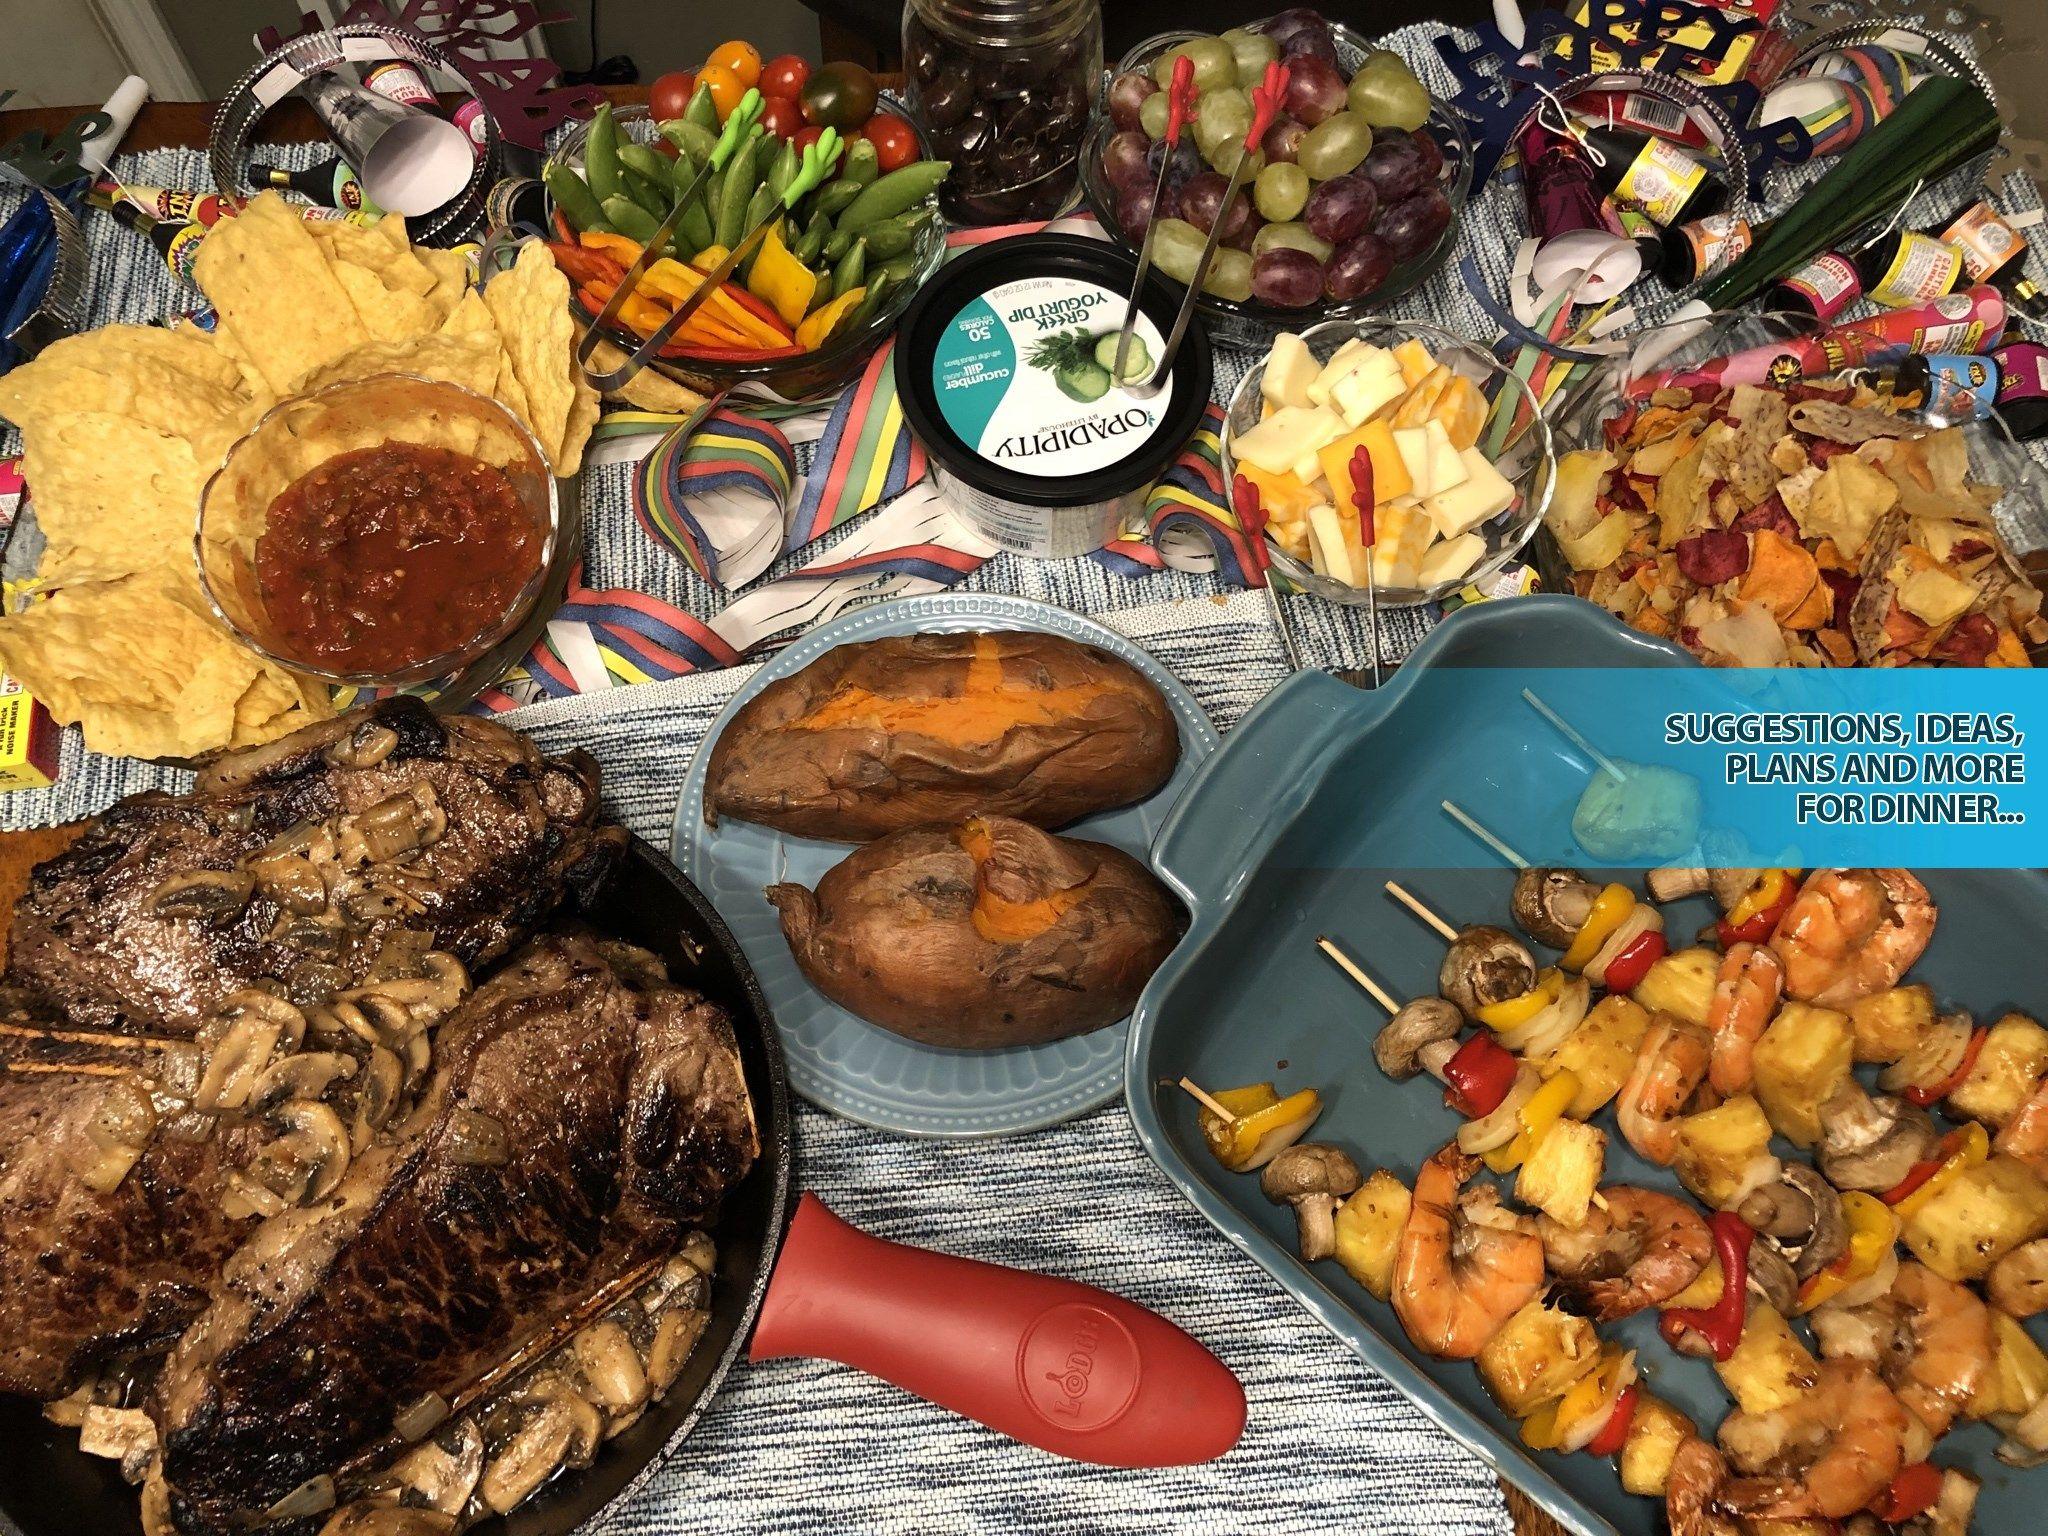 Shabbat Dinner Food 2020